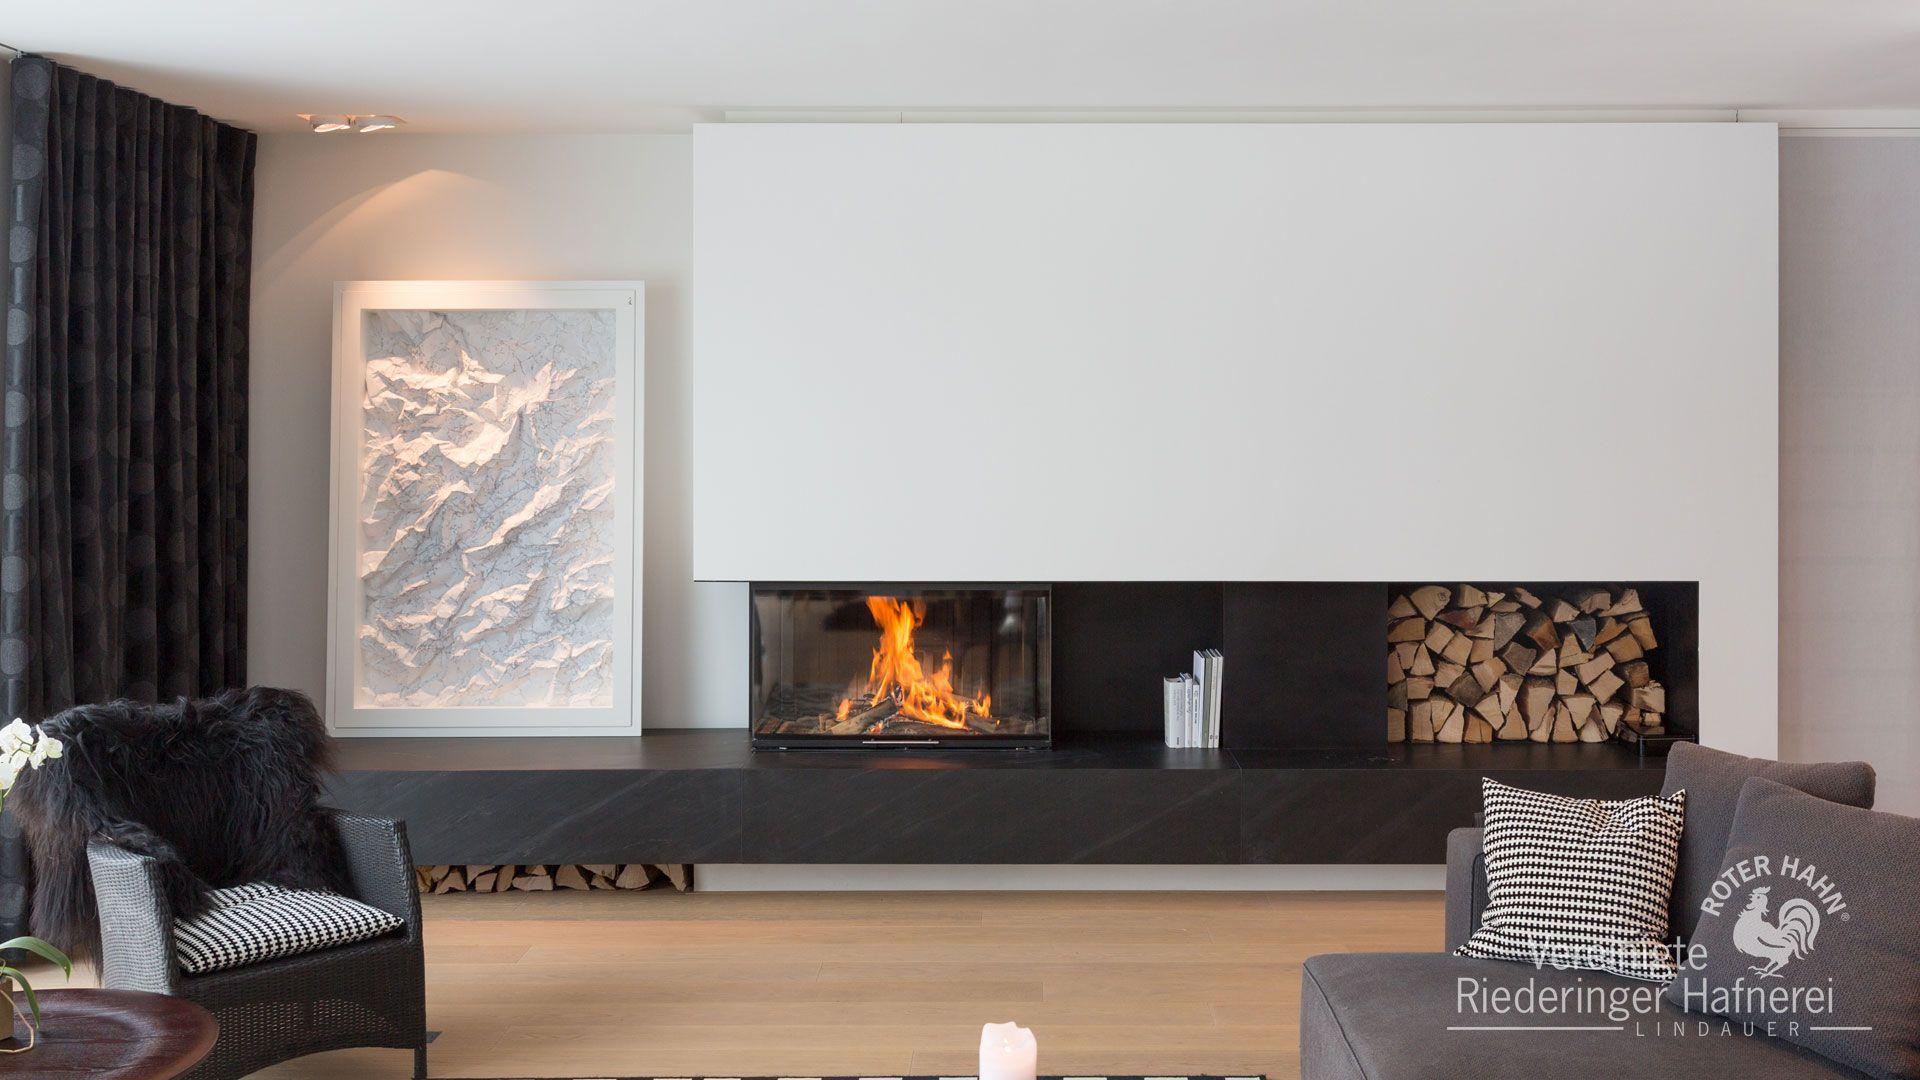 Riederinger Hafnerei panoramakamin panoramakamin kamin ofen fireplace ofenkunst